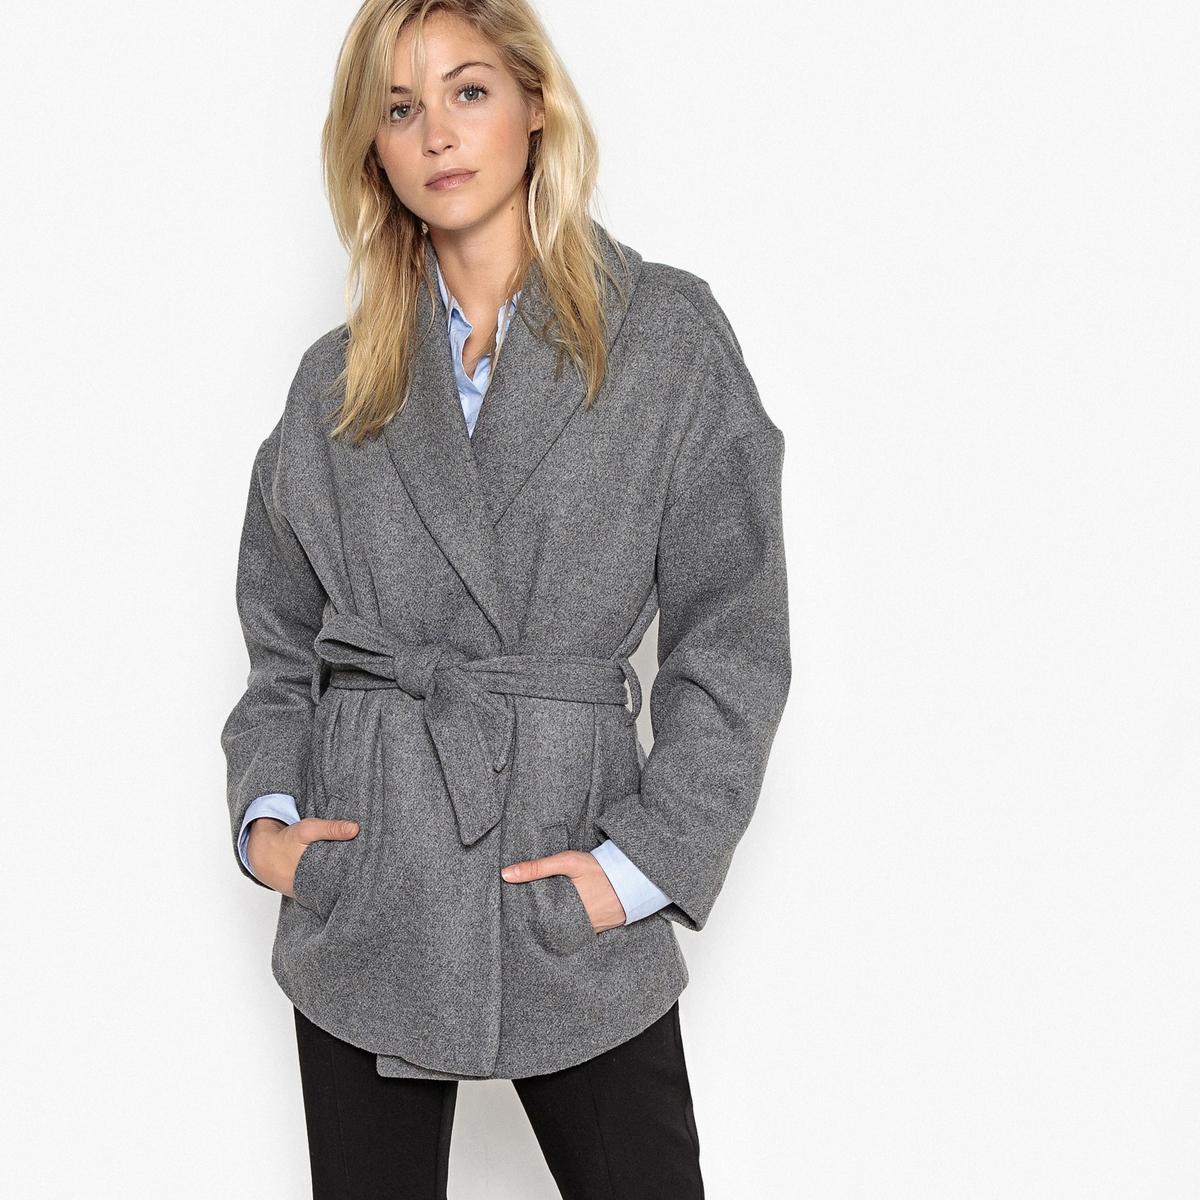 Пальто-халат, 50% шерсти пальто драповое 30% шерсти